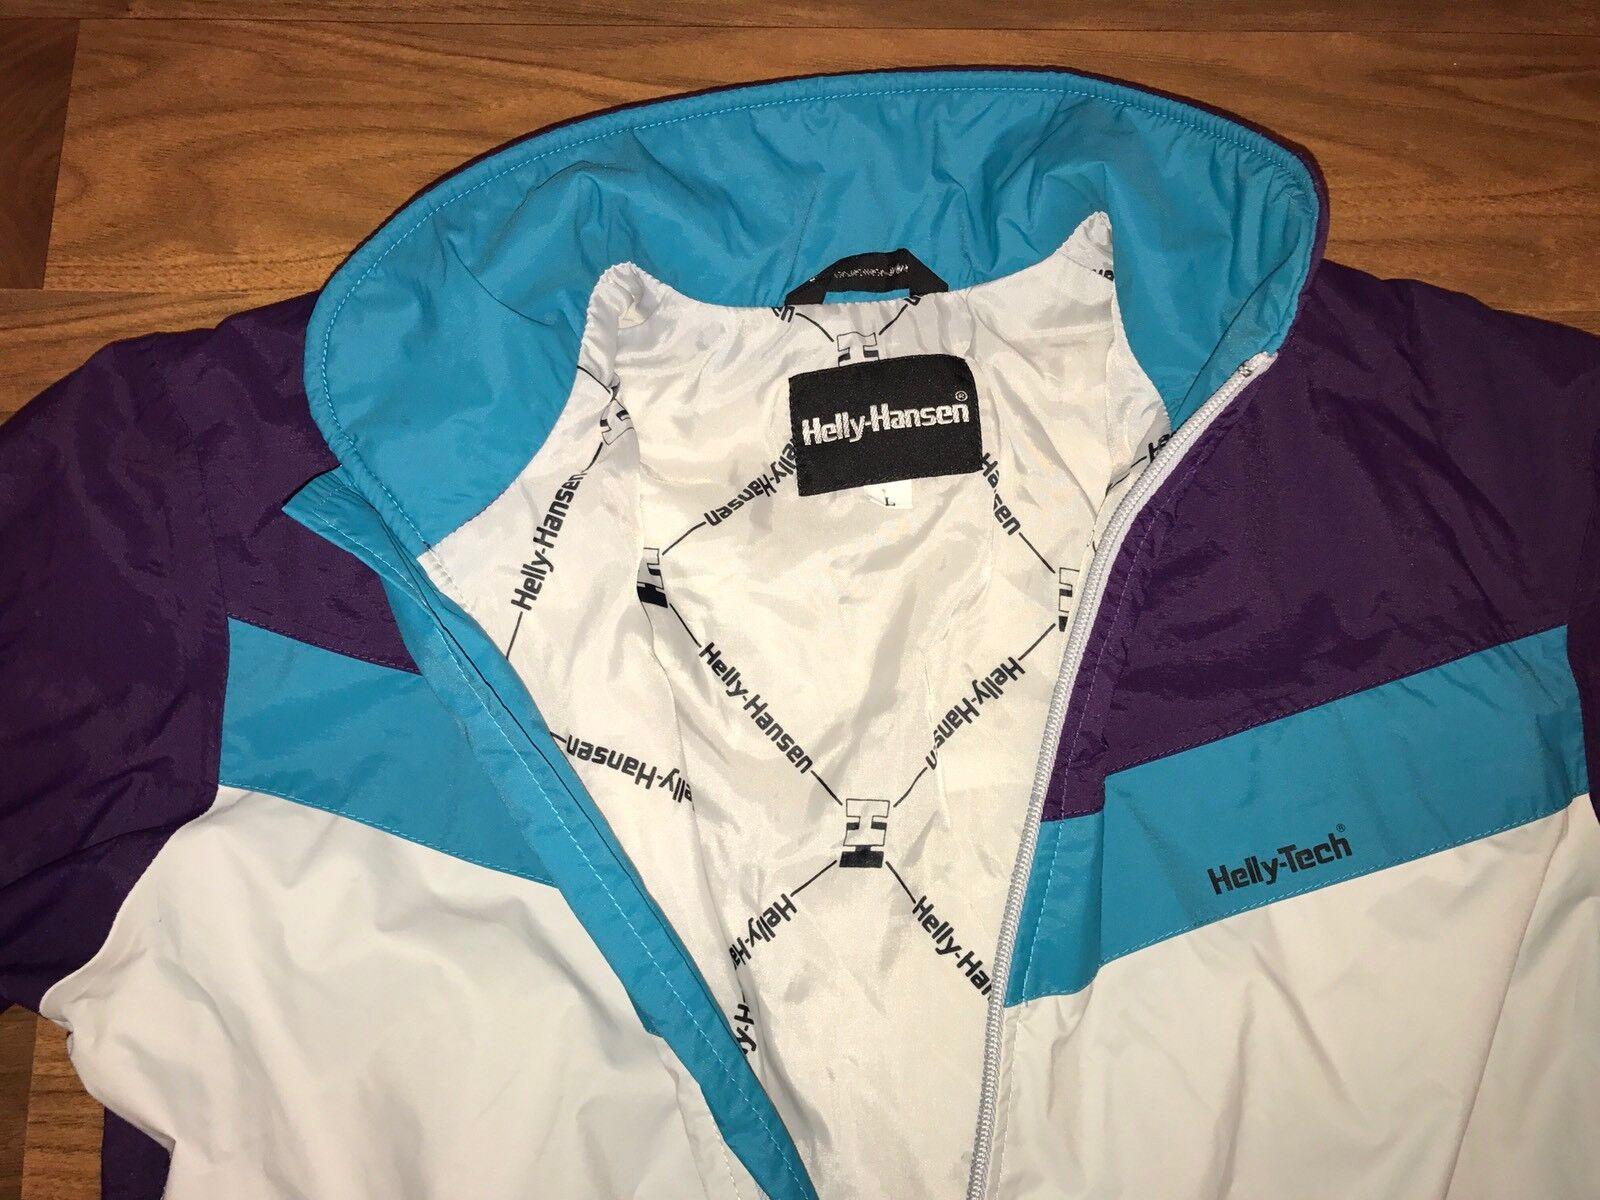 Vtg 80s HellyTech HELLY HANSEN Womens LARGE One Piece SKI SUIT Snow Bib Snowsuit